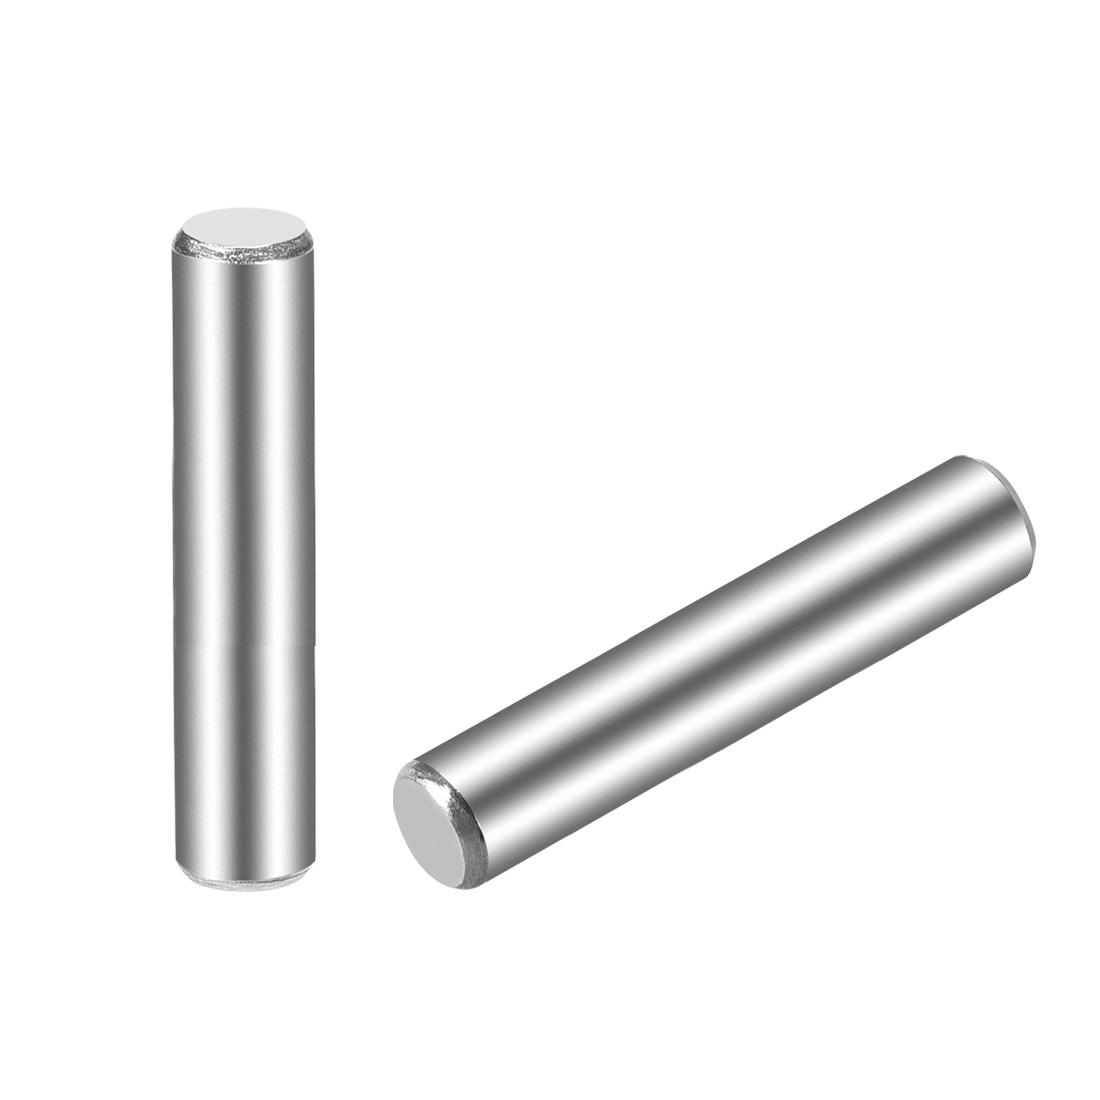 25Pcs 5mm x 30mm Dowel Pin 304 Stainless Steel Shelf Support Pin Fasten